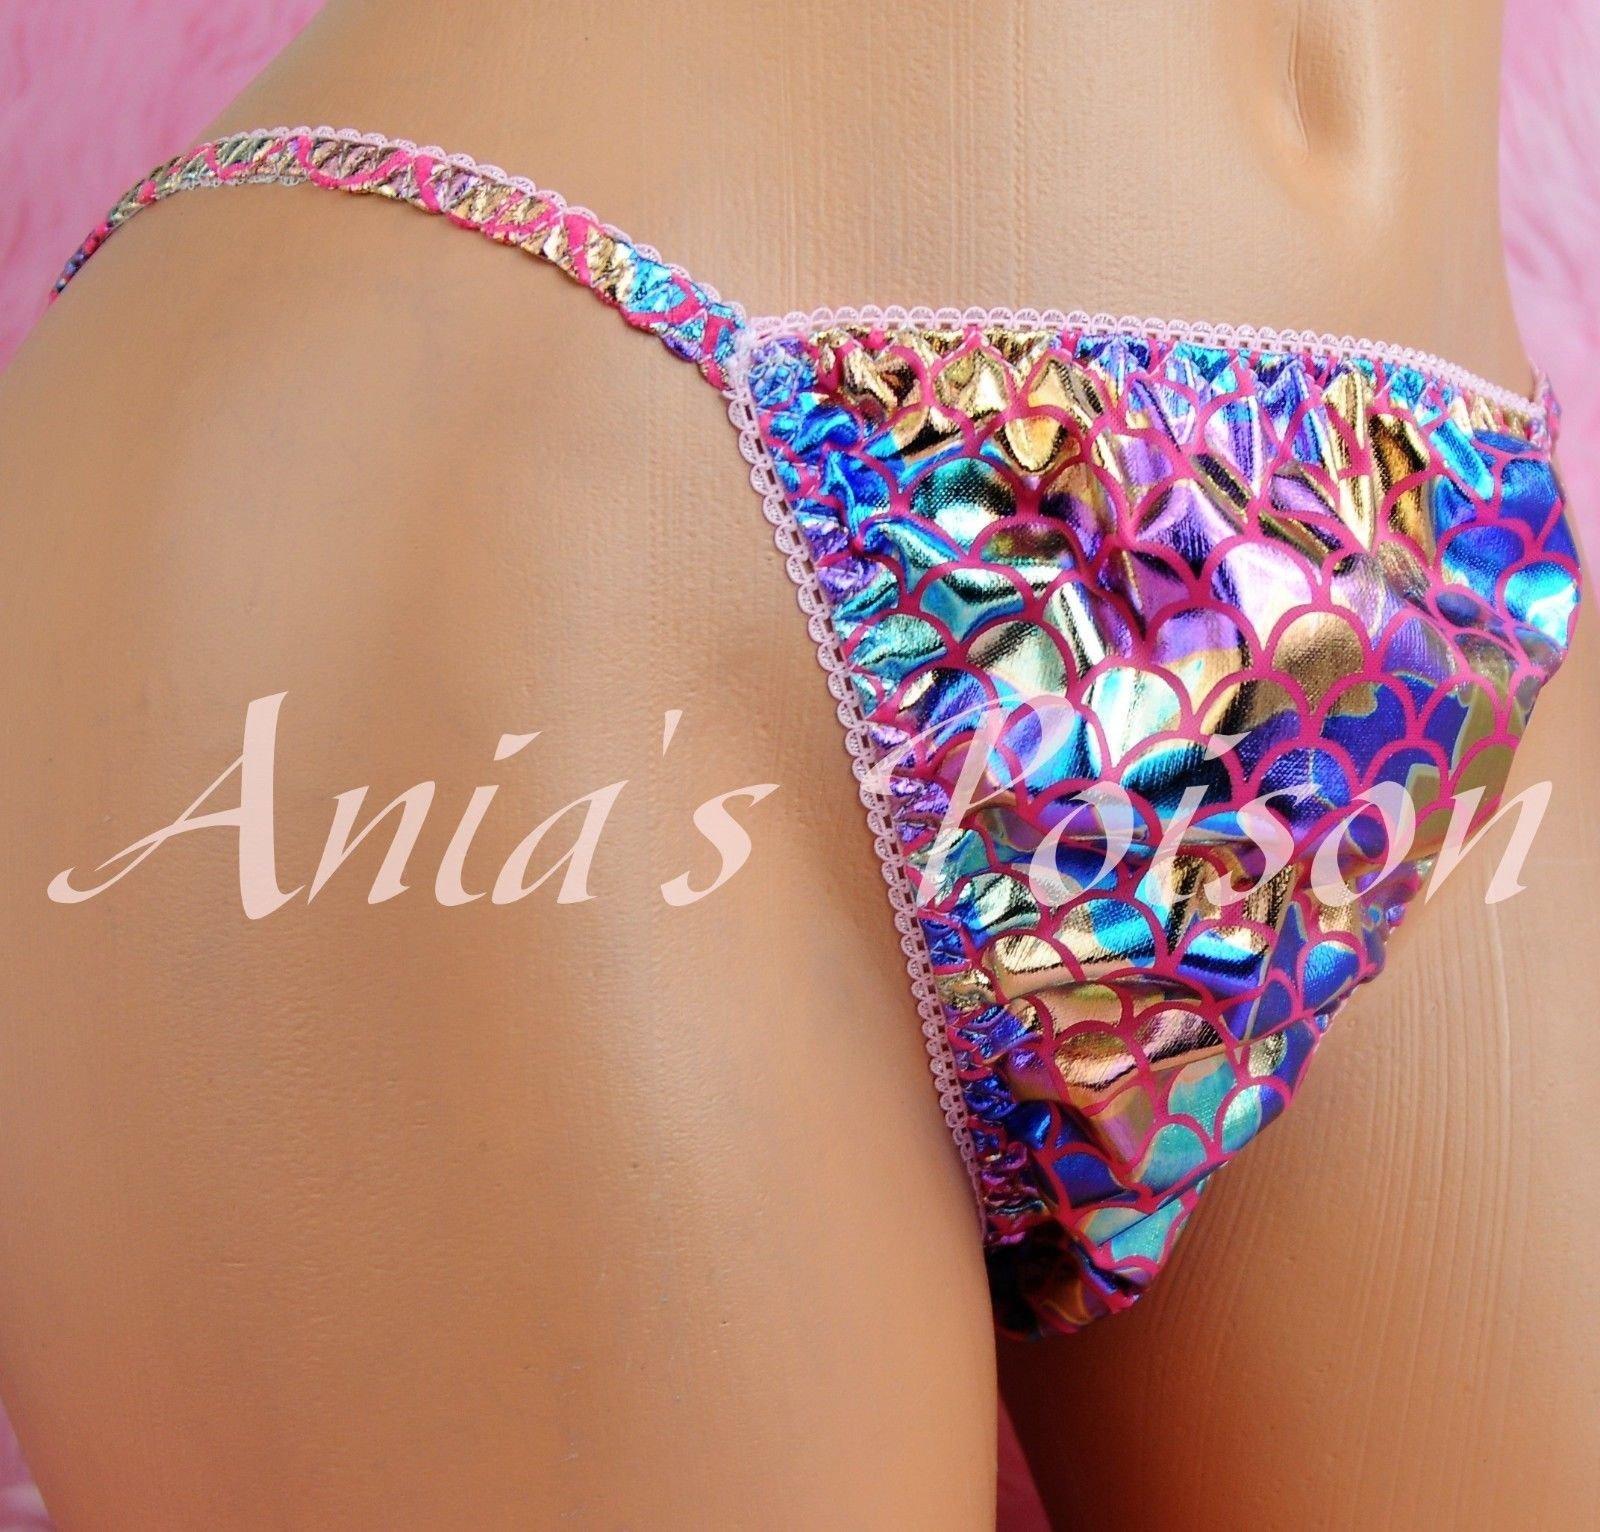 Anias Poison MANties S M L XL XXL metallic shiny FOIL Scaly Mermaid string bikini sissy mens Dancer panties